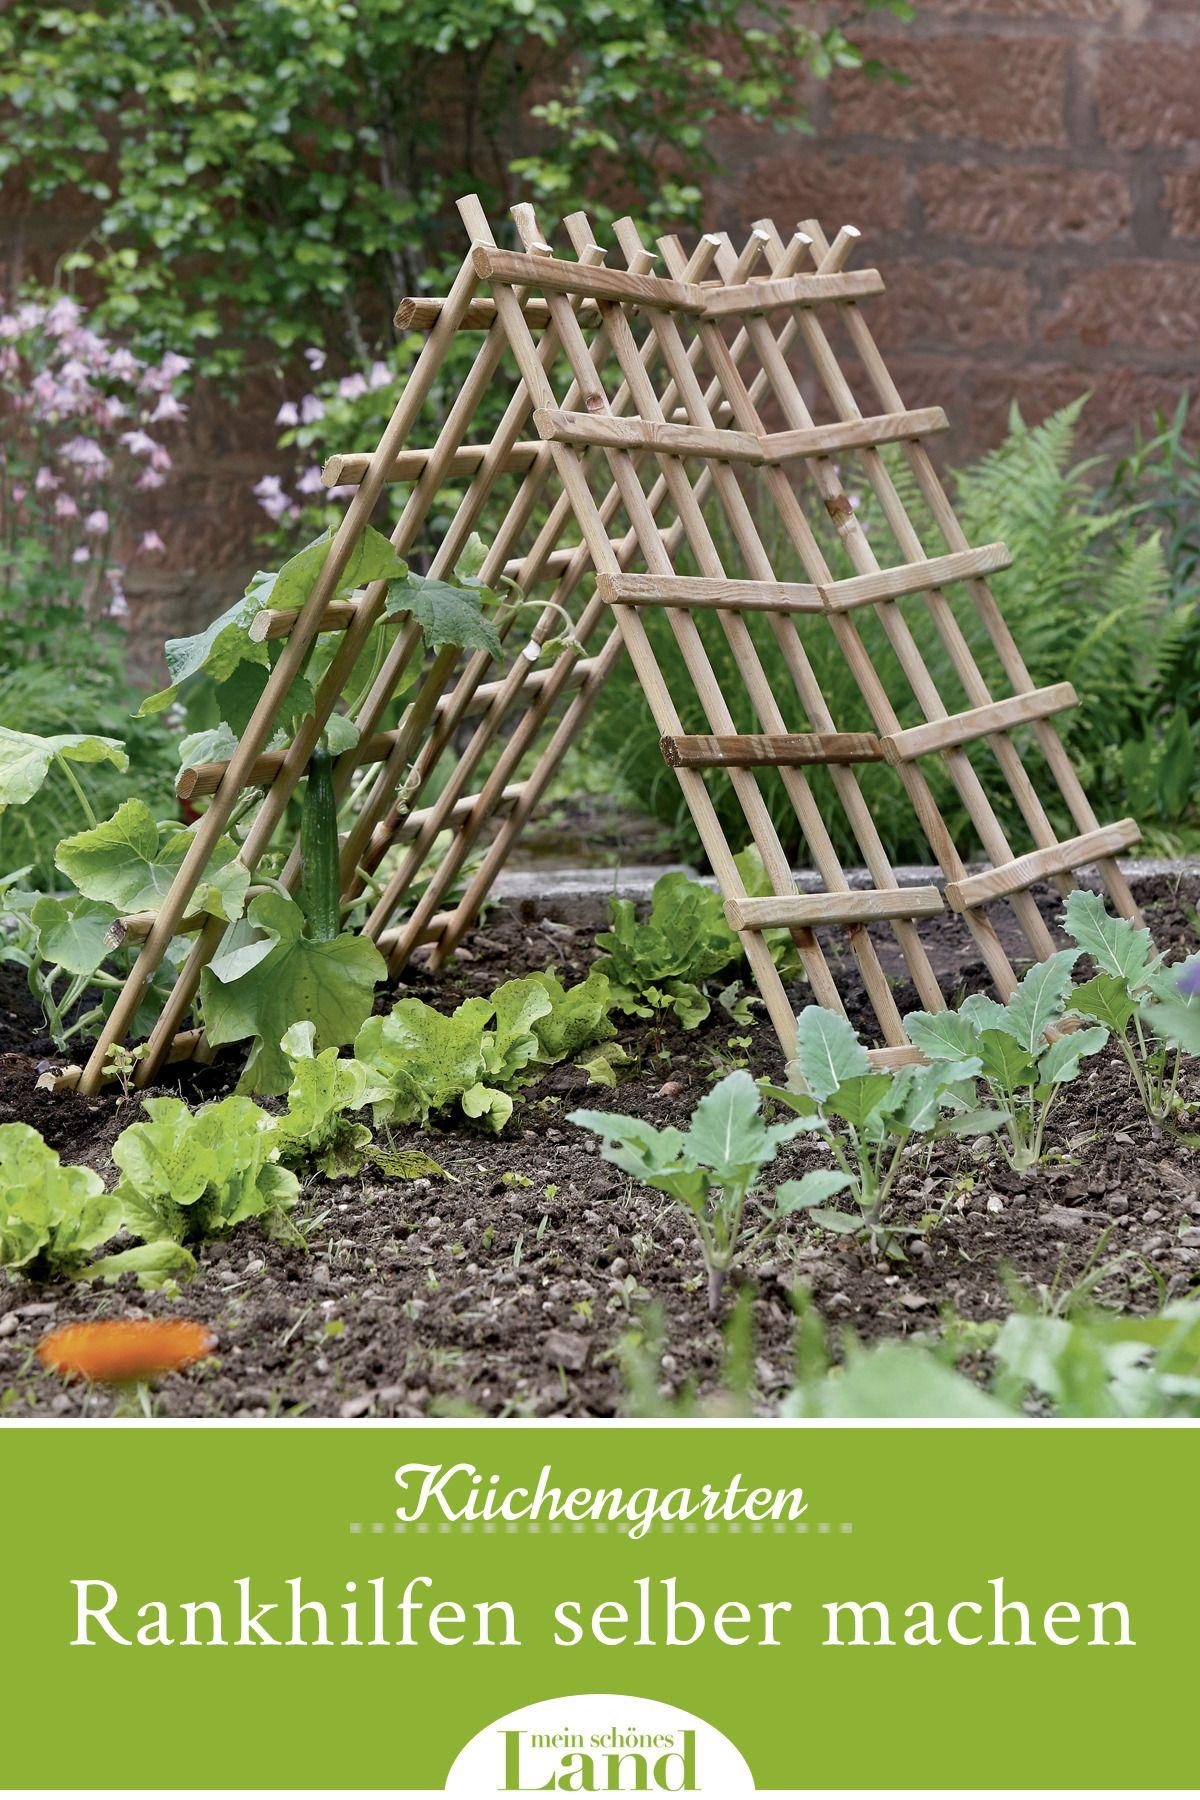 Rankhilfe Selber Bauen Rankhilfe Selber Bauen Rankhilfe Gartenarten